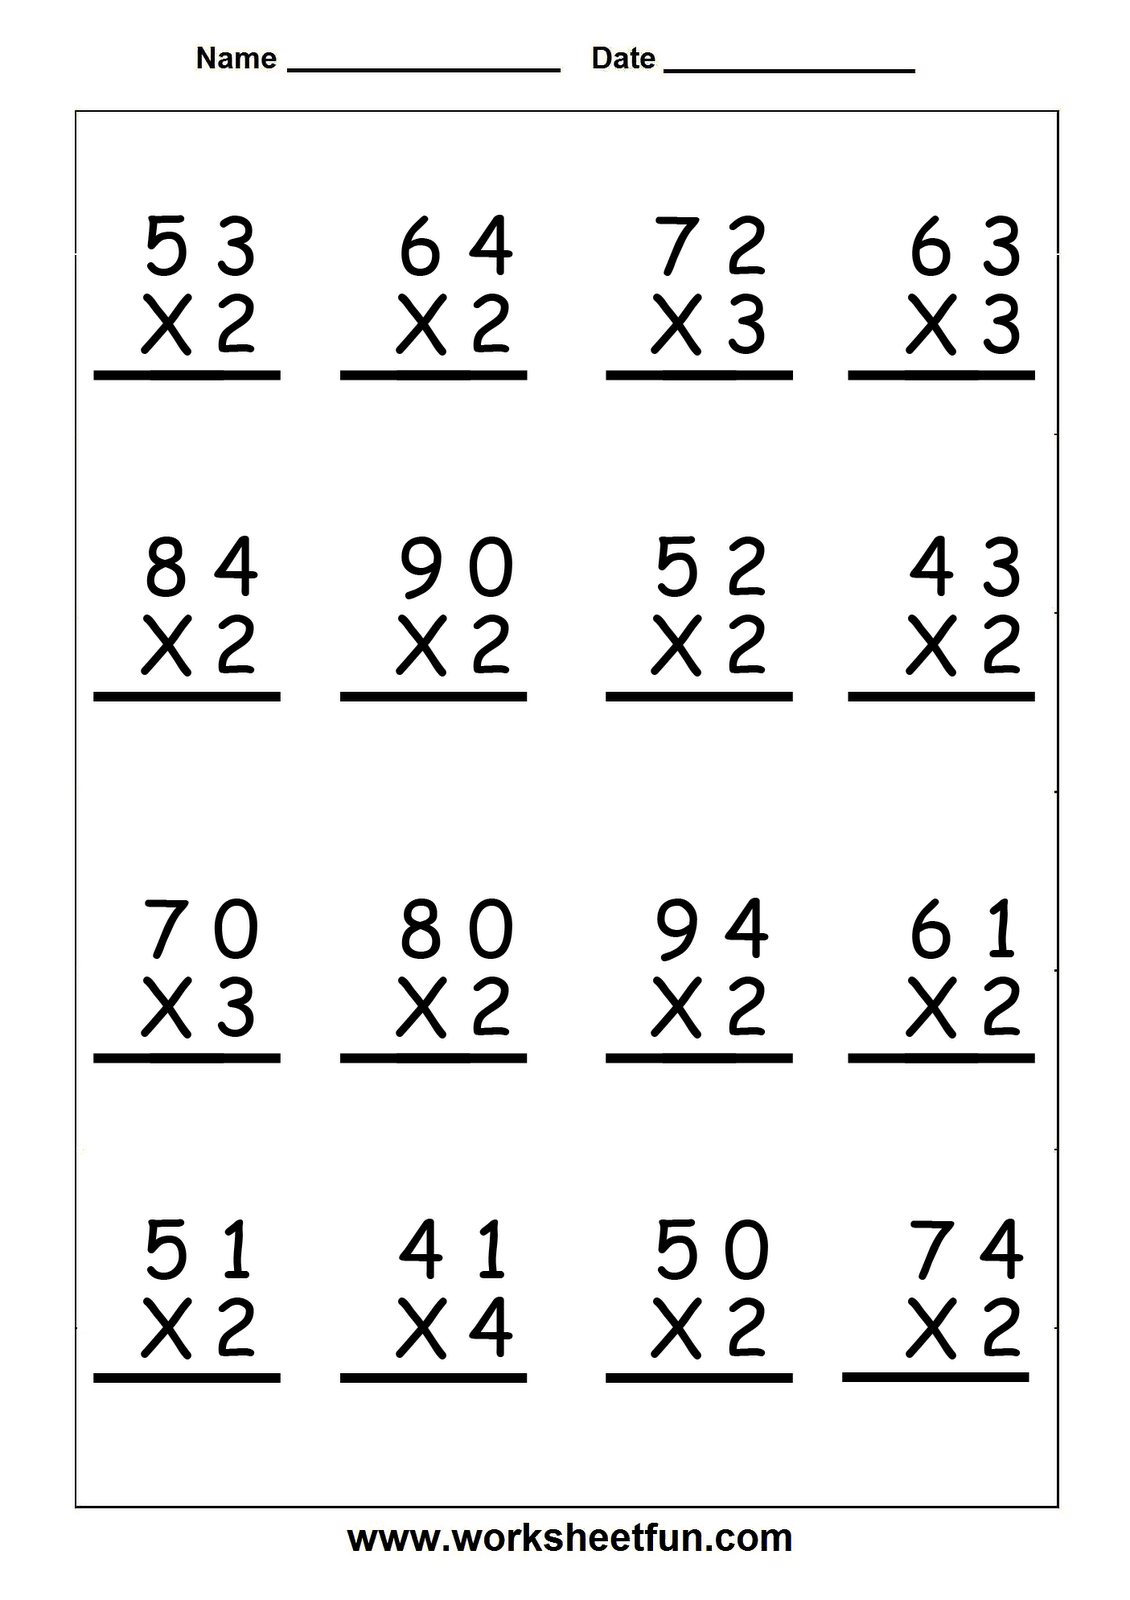 hight resolution of https://dubaikhalifas.com/1st-grade-measurement-activities-5th-grade-multiplication-test-4th-grade-math-worksheets/